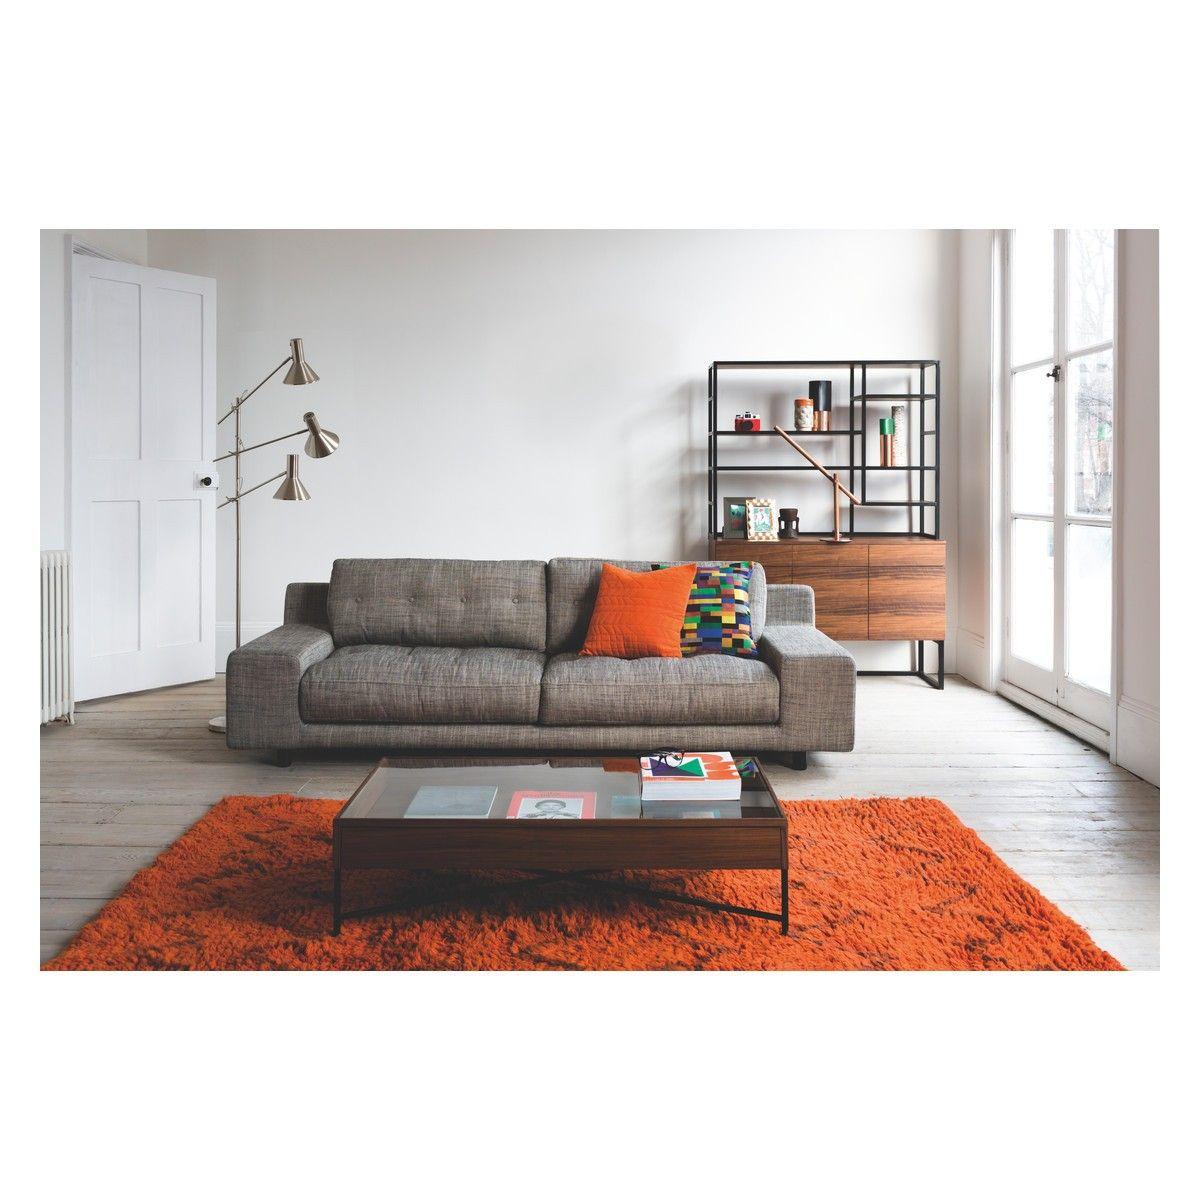 Habitat Sofas appealing living room furniture habitat ideas ideas house design